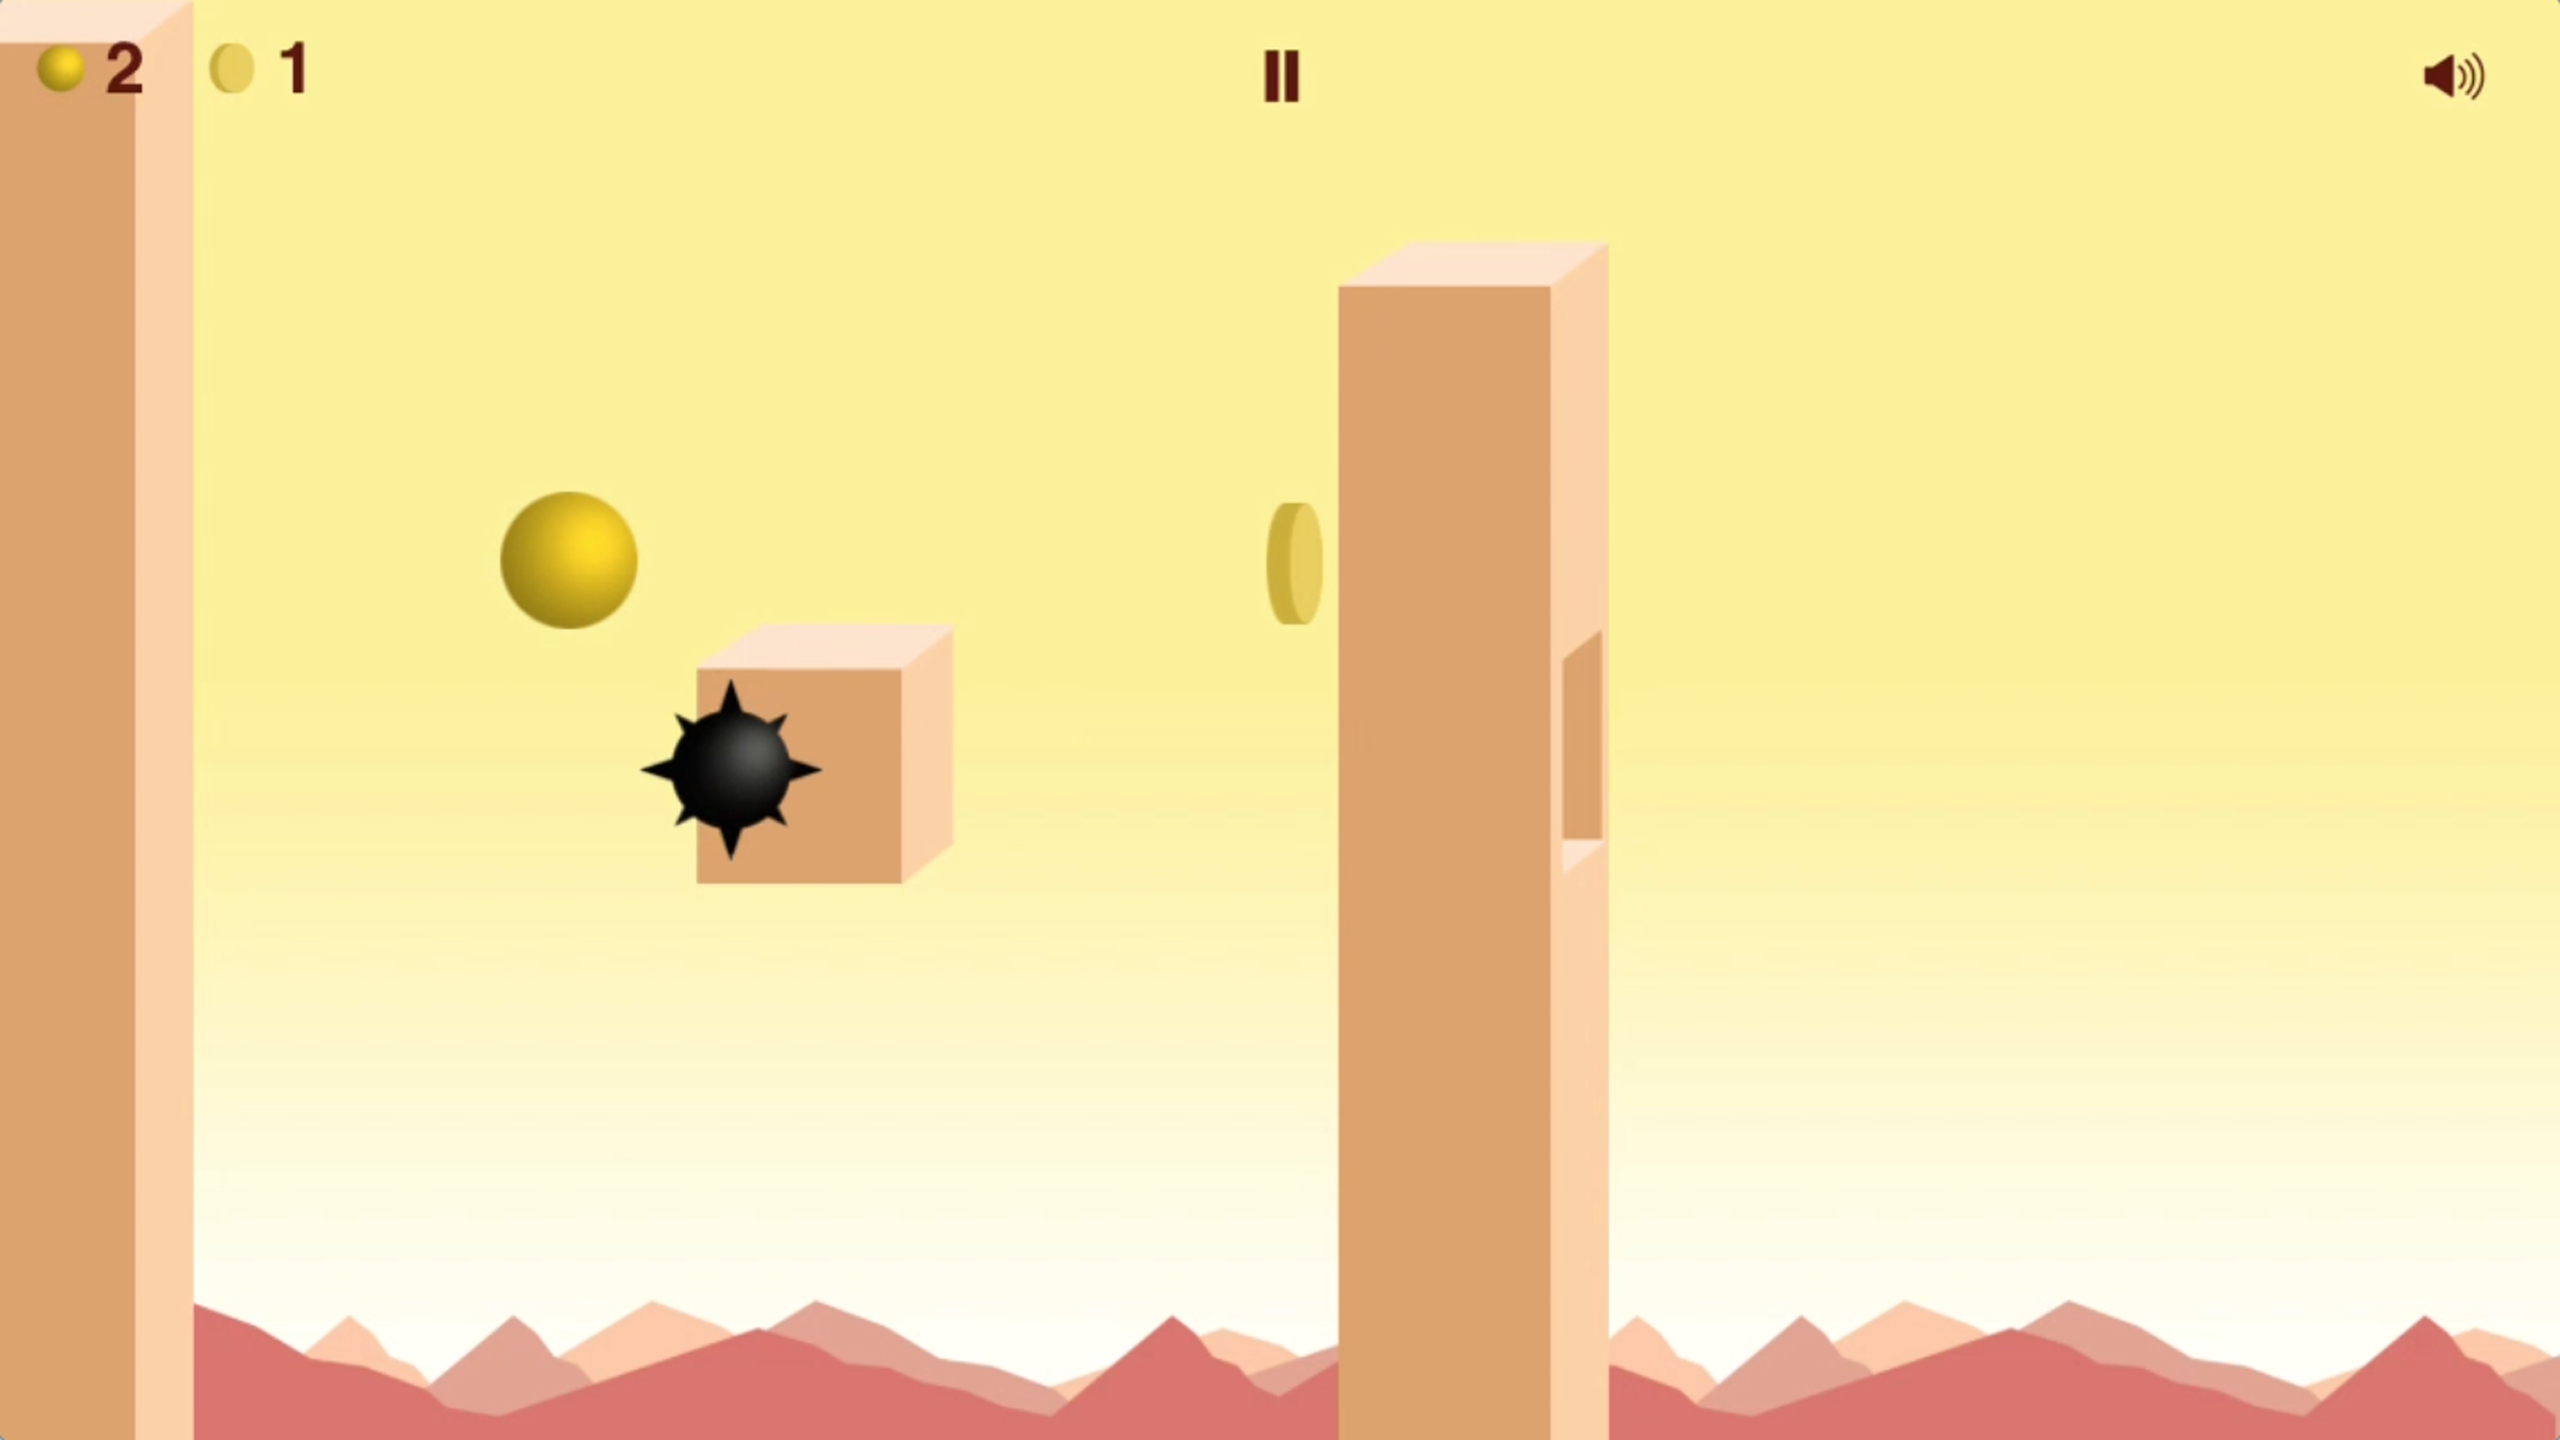 Hole in the Wall Screenshot 4